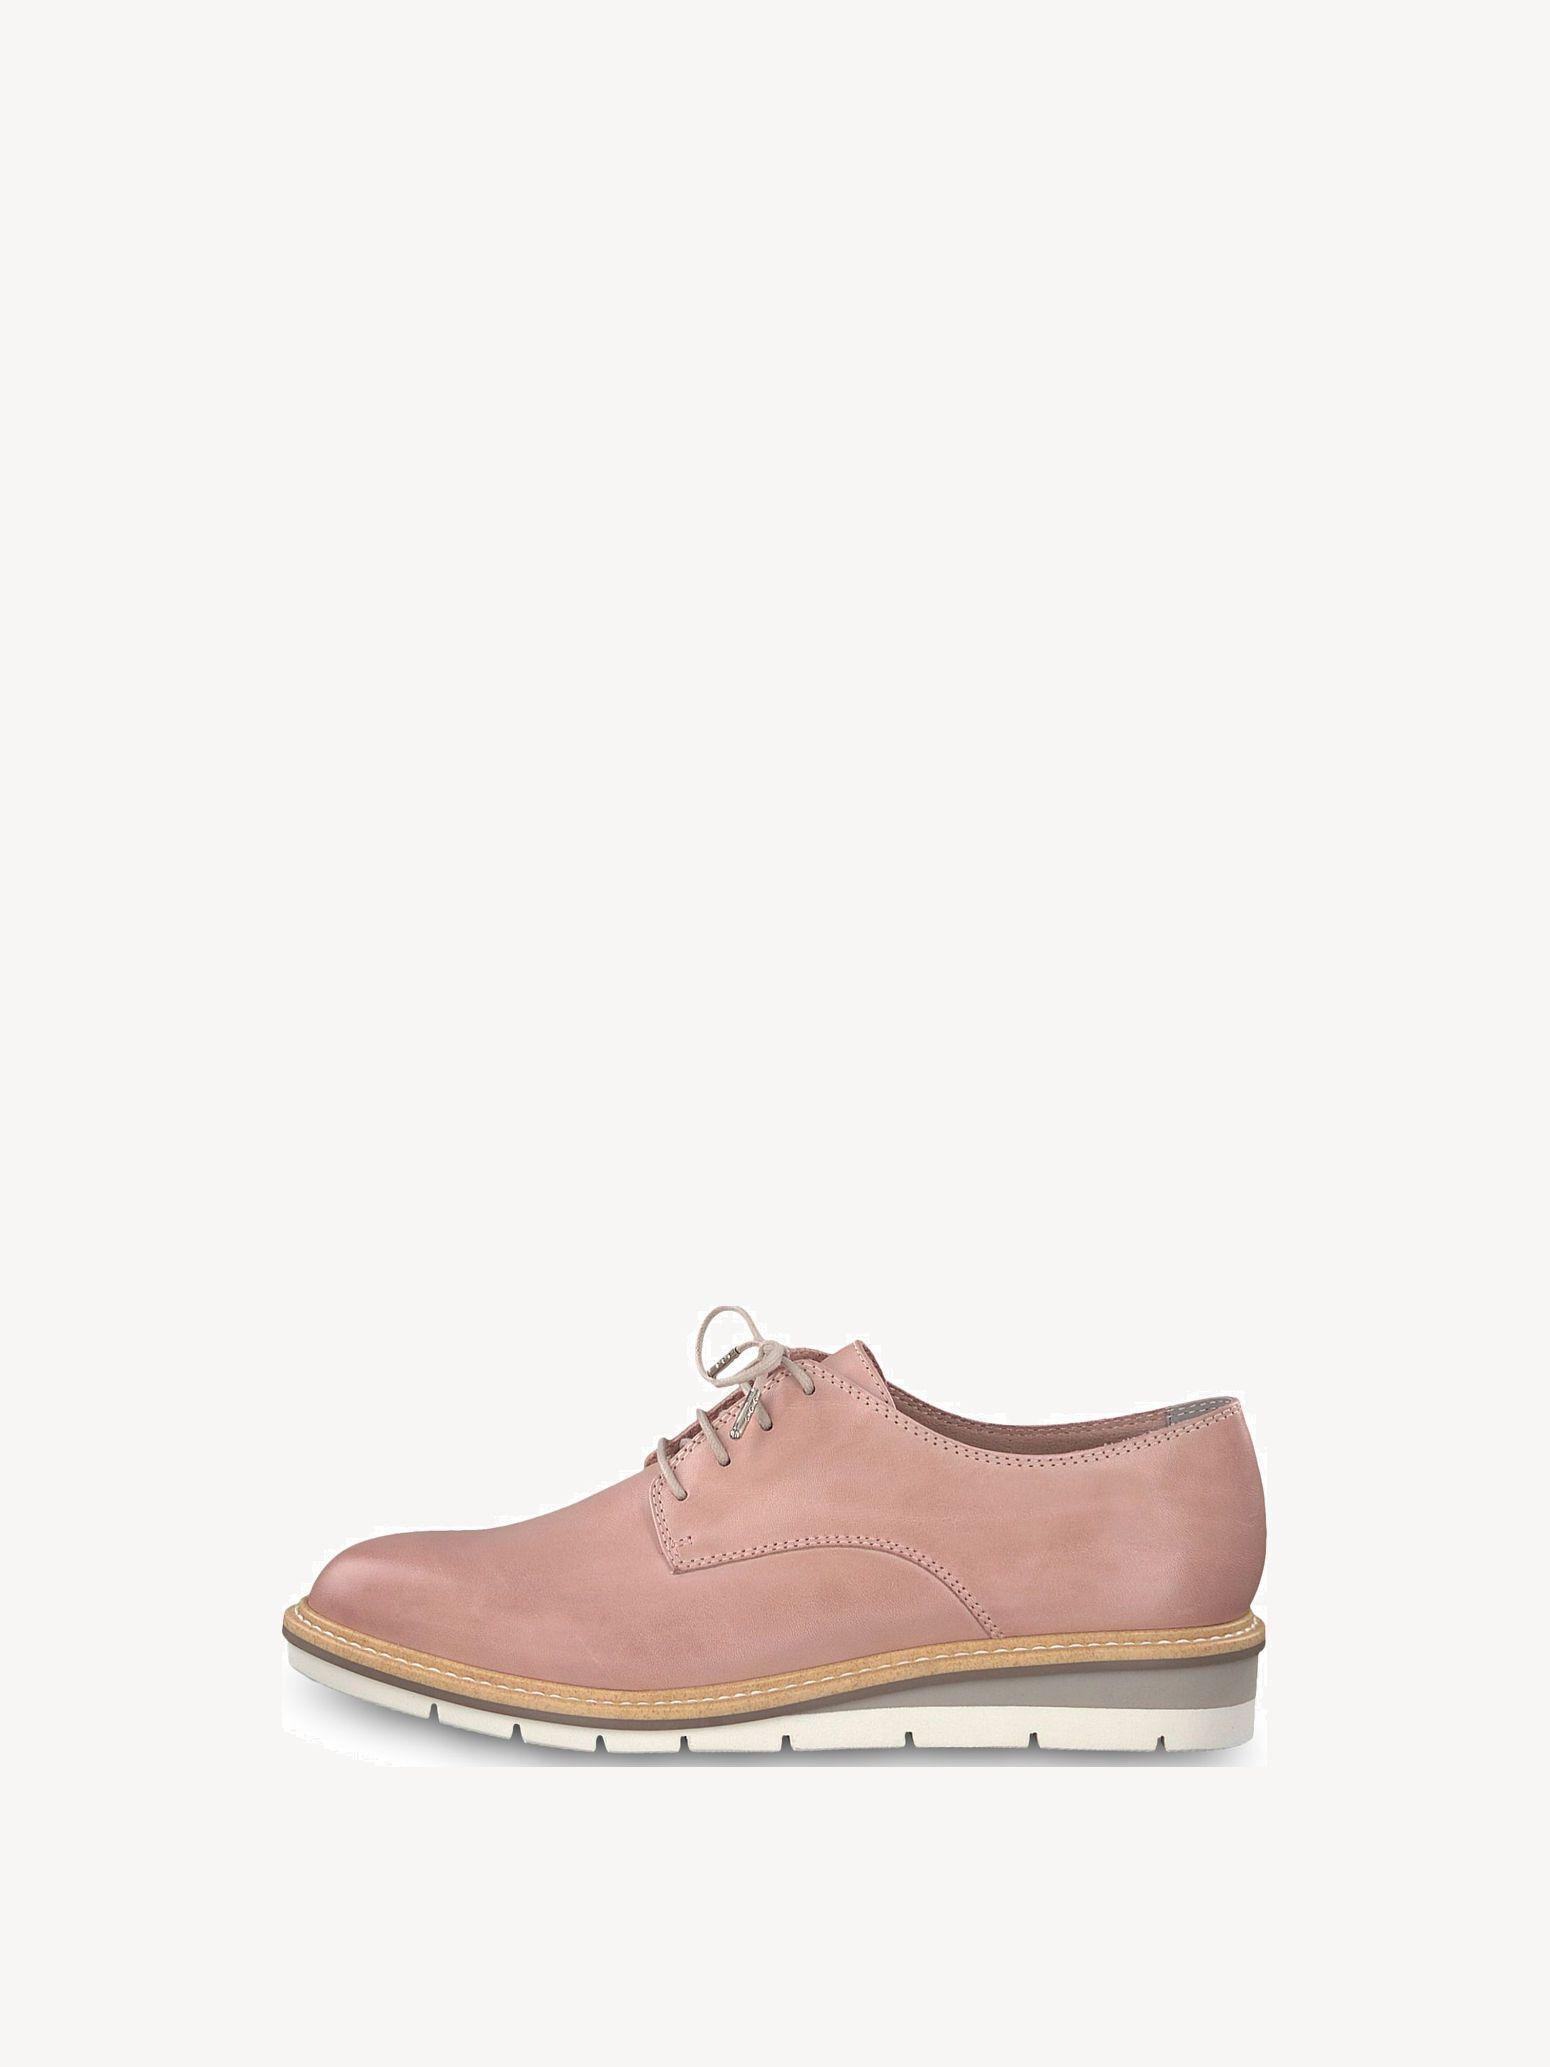 Tamaris Chaussures Chaussures Basses Tamaris Chaussures Femmes Femmes Femmes Tamaris Basses Basses SSrtx0U